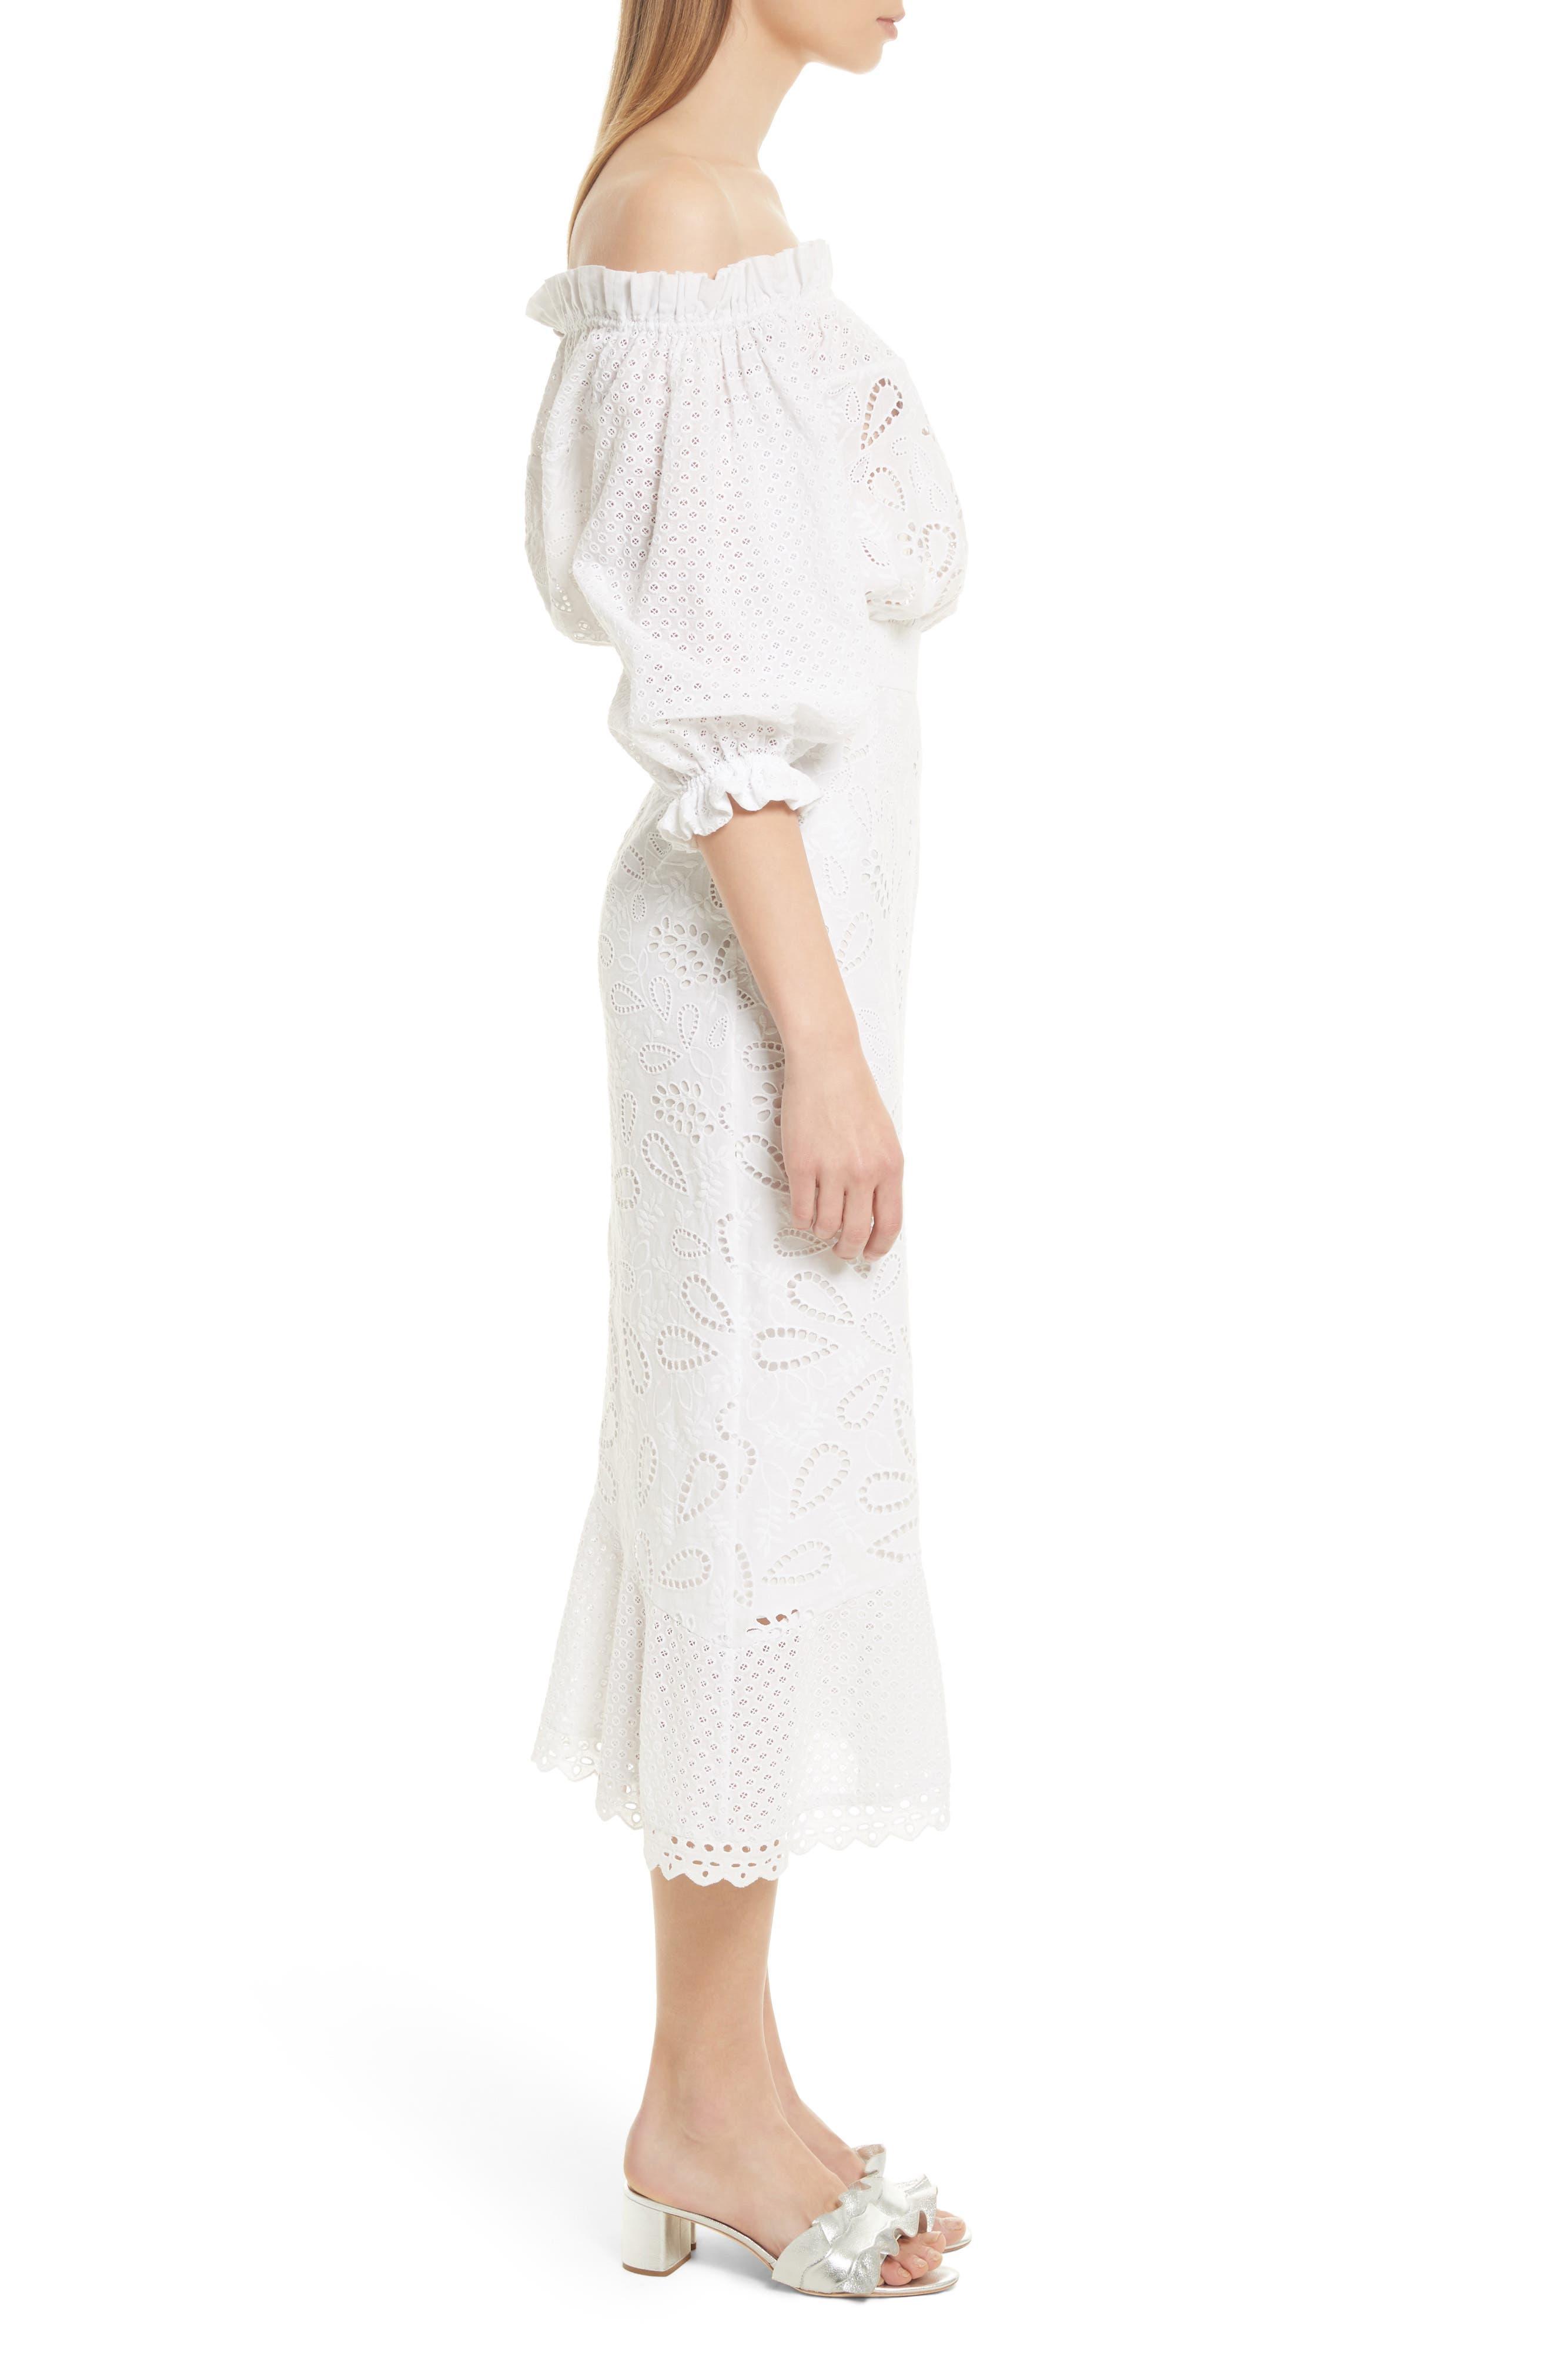 Grace Cotton Off the Shoulder Dress,                             Alternate thumbnail 3, color,                             White/ French Lace